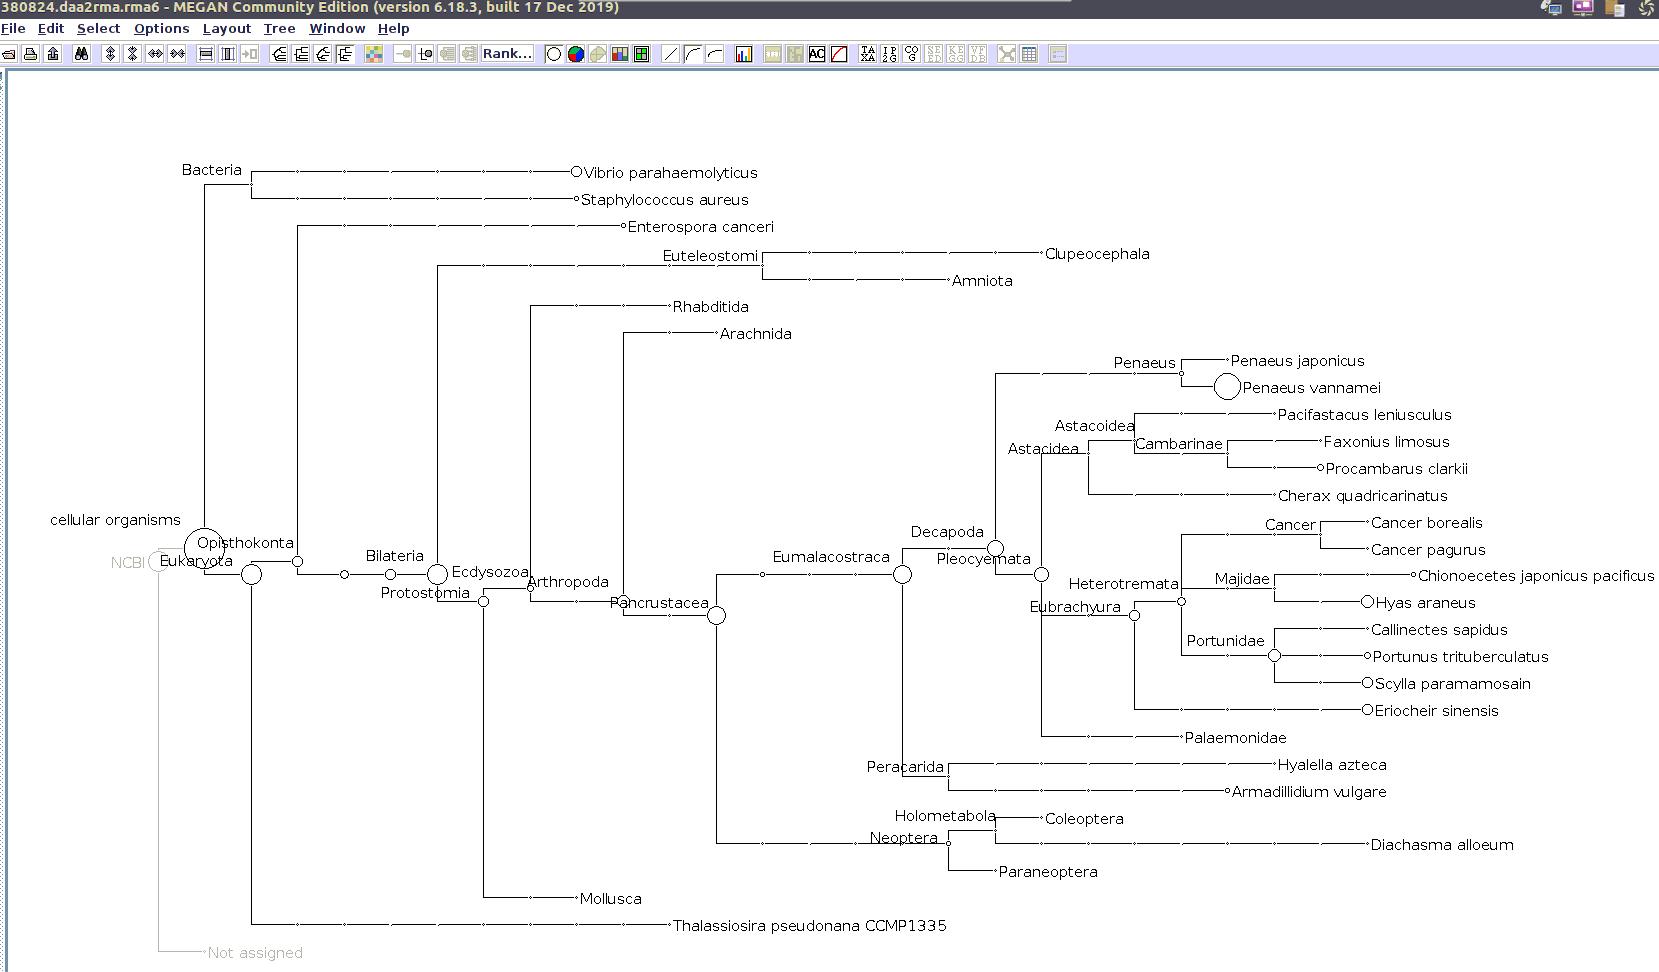 (MEGAN taxonomic tree for 380824